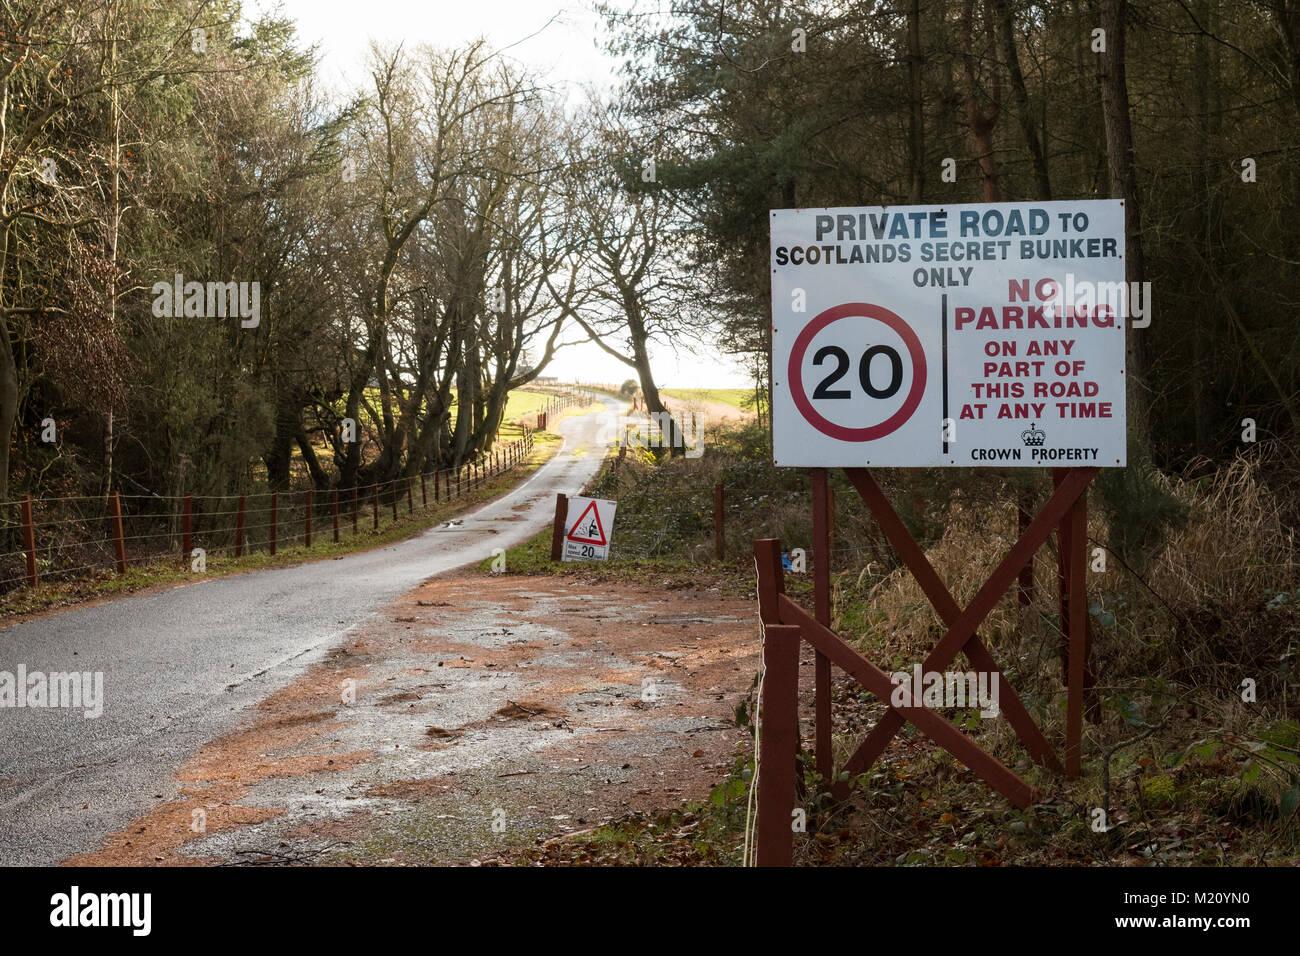 signs leading to Scotlands Secret Bunker, Troy Wood, Fife, Scotland, UK - Stock Image